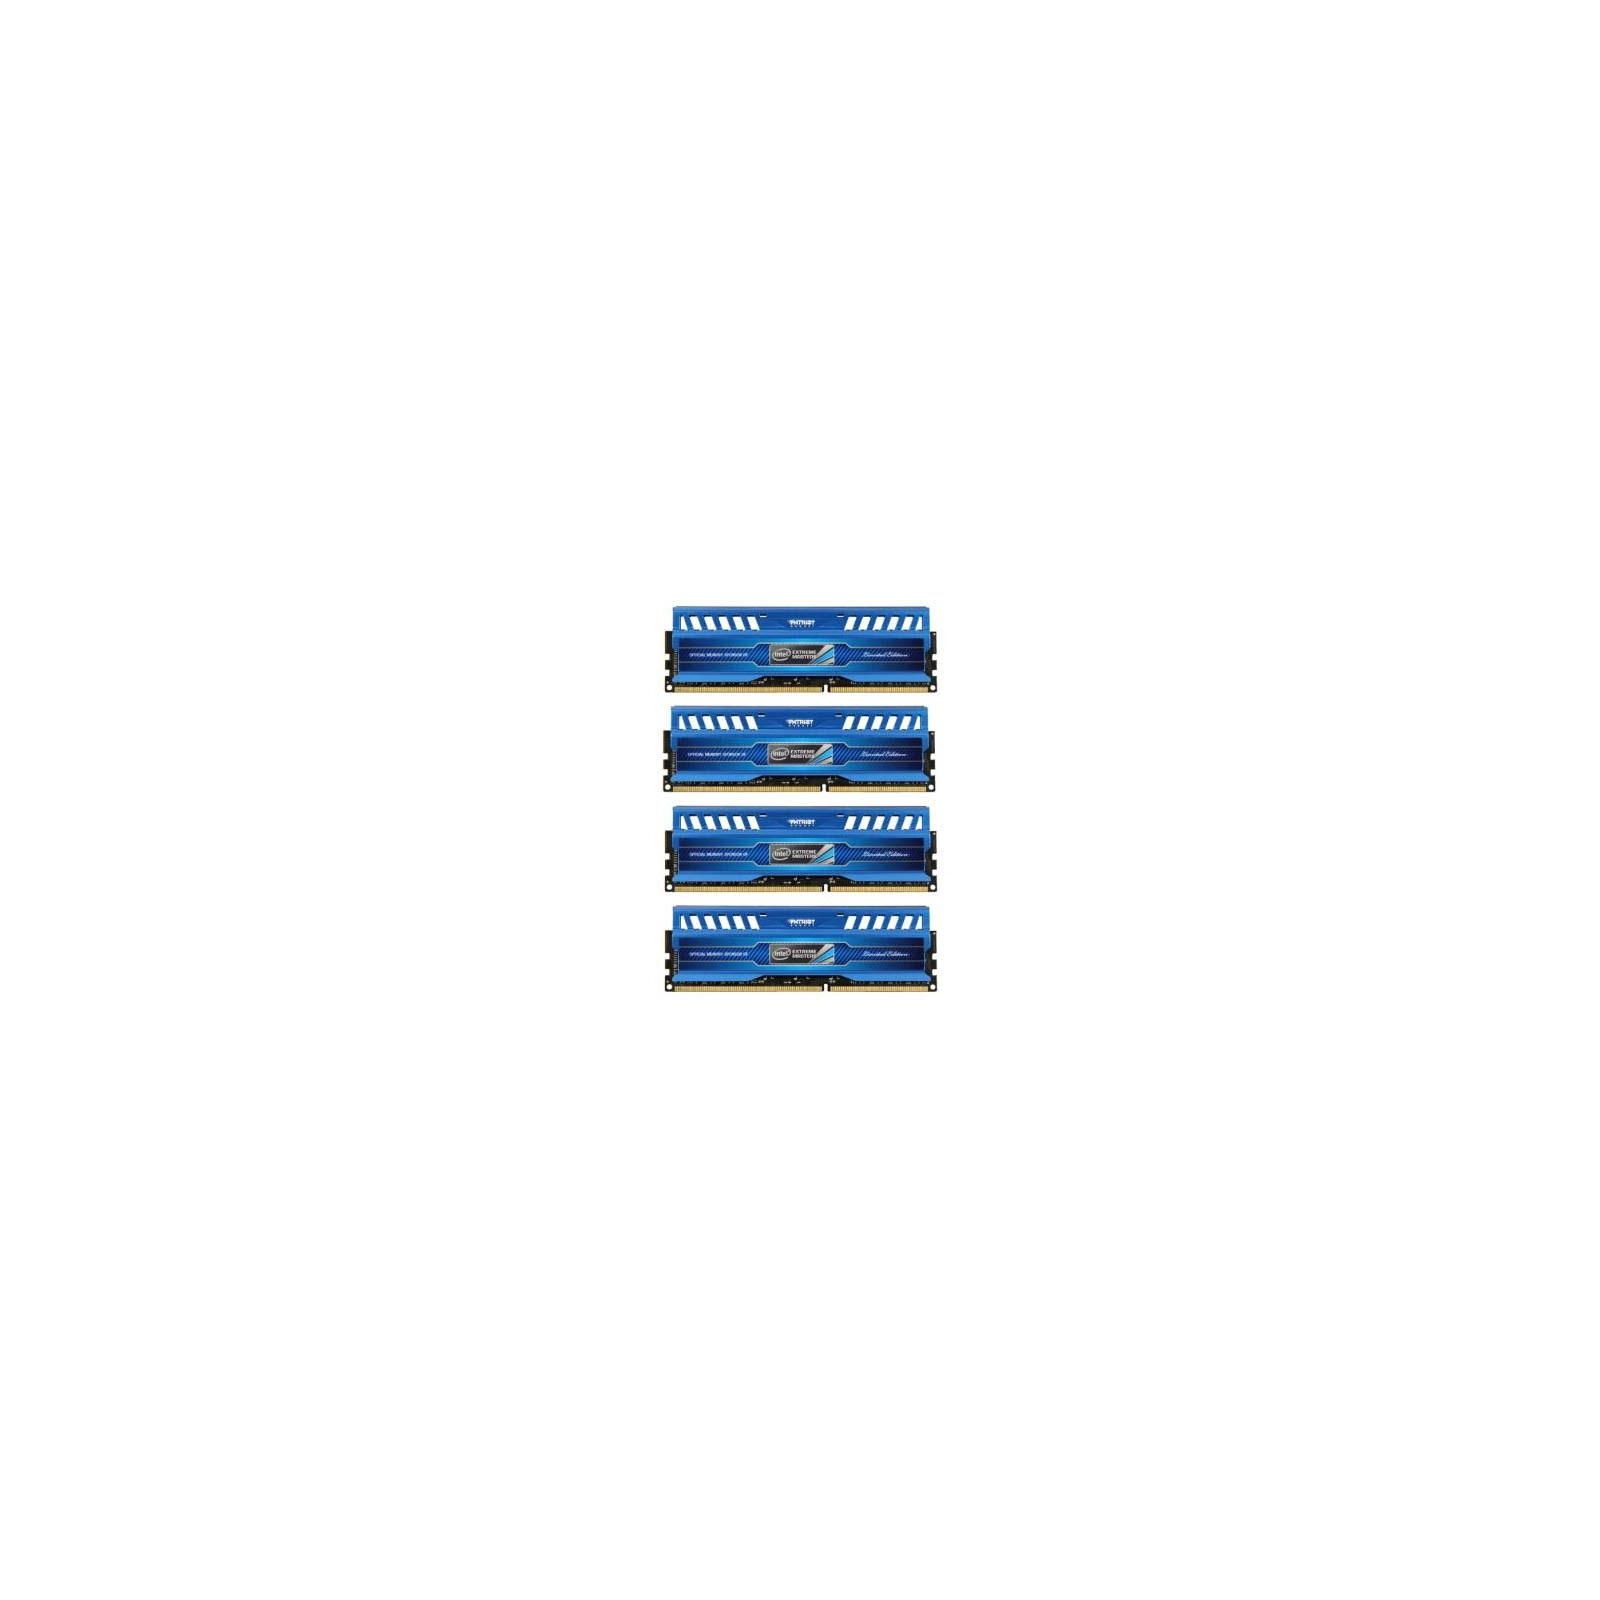 Модуль памяти для компьютера DDR3 16GB (4x4GB) 1600 MHz Patriot (PVI316G160C9QK)